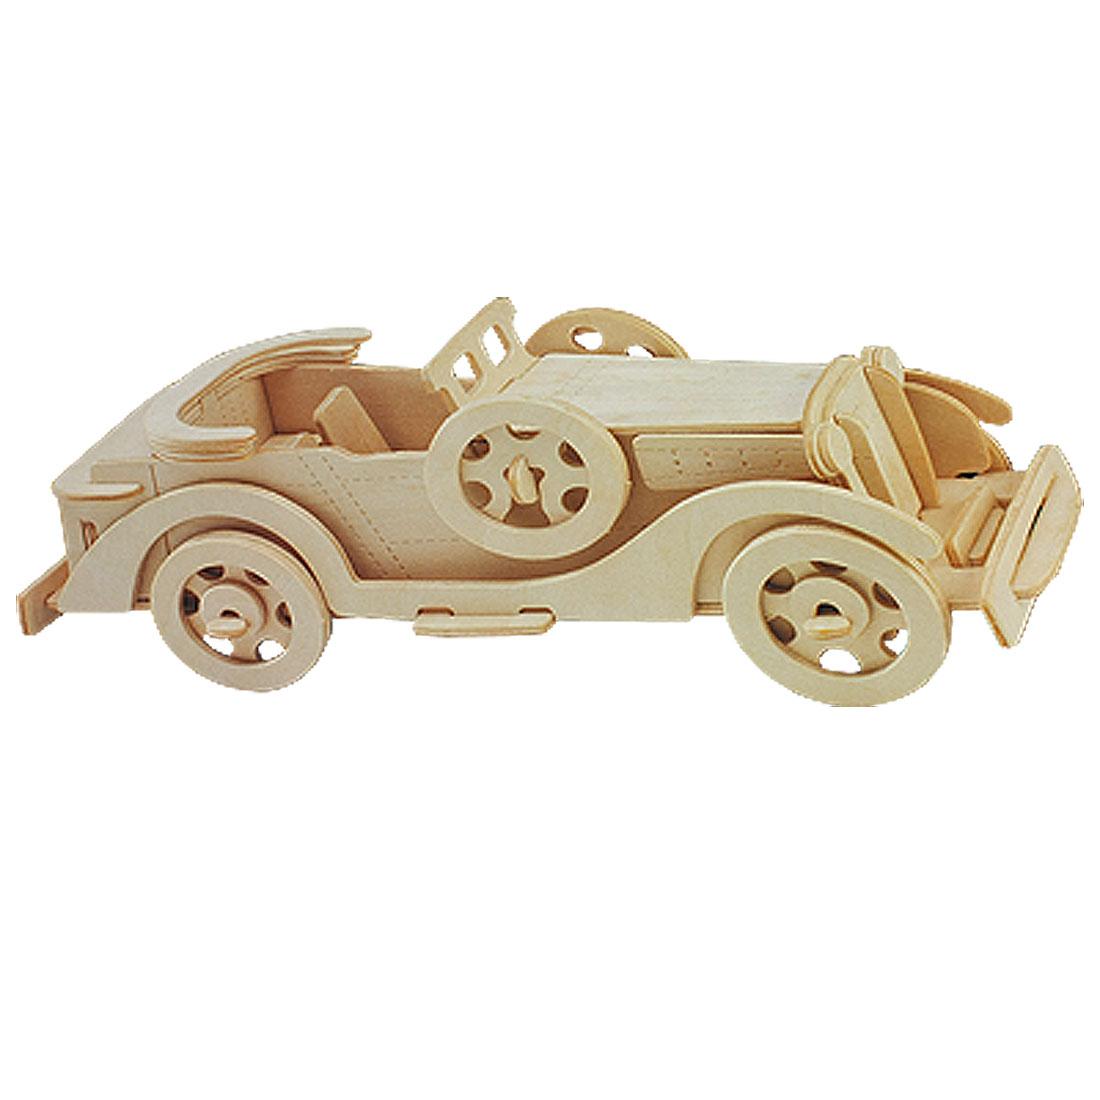 Packard Twelve Model Puzzled 3D DIY Assemble Wooden Kit for Child